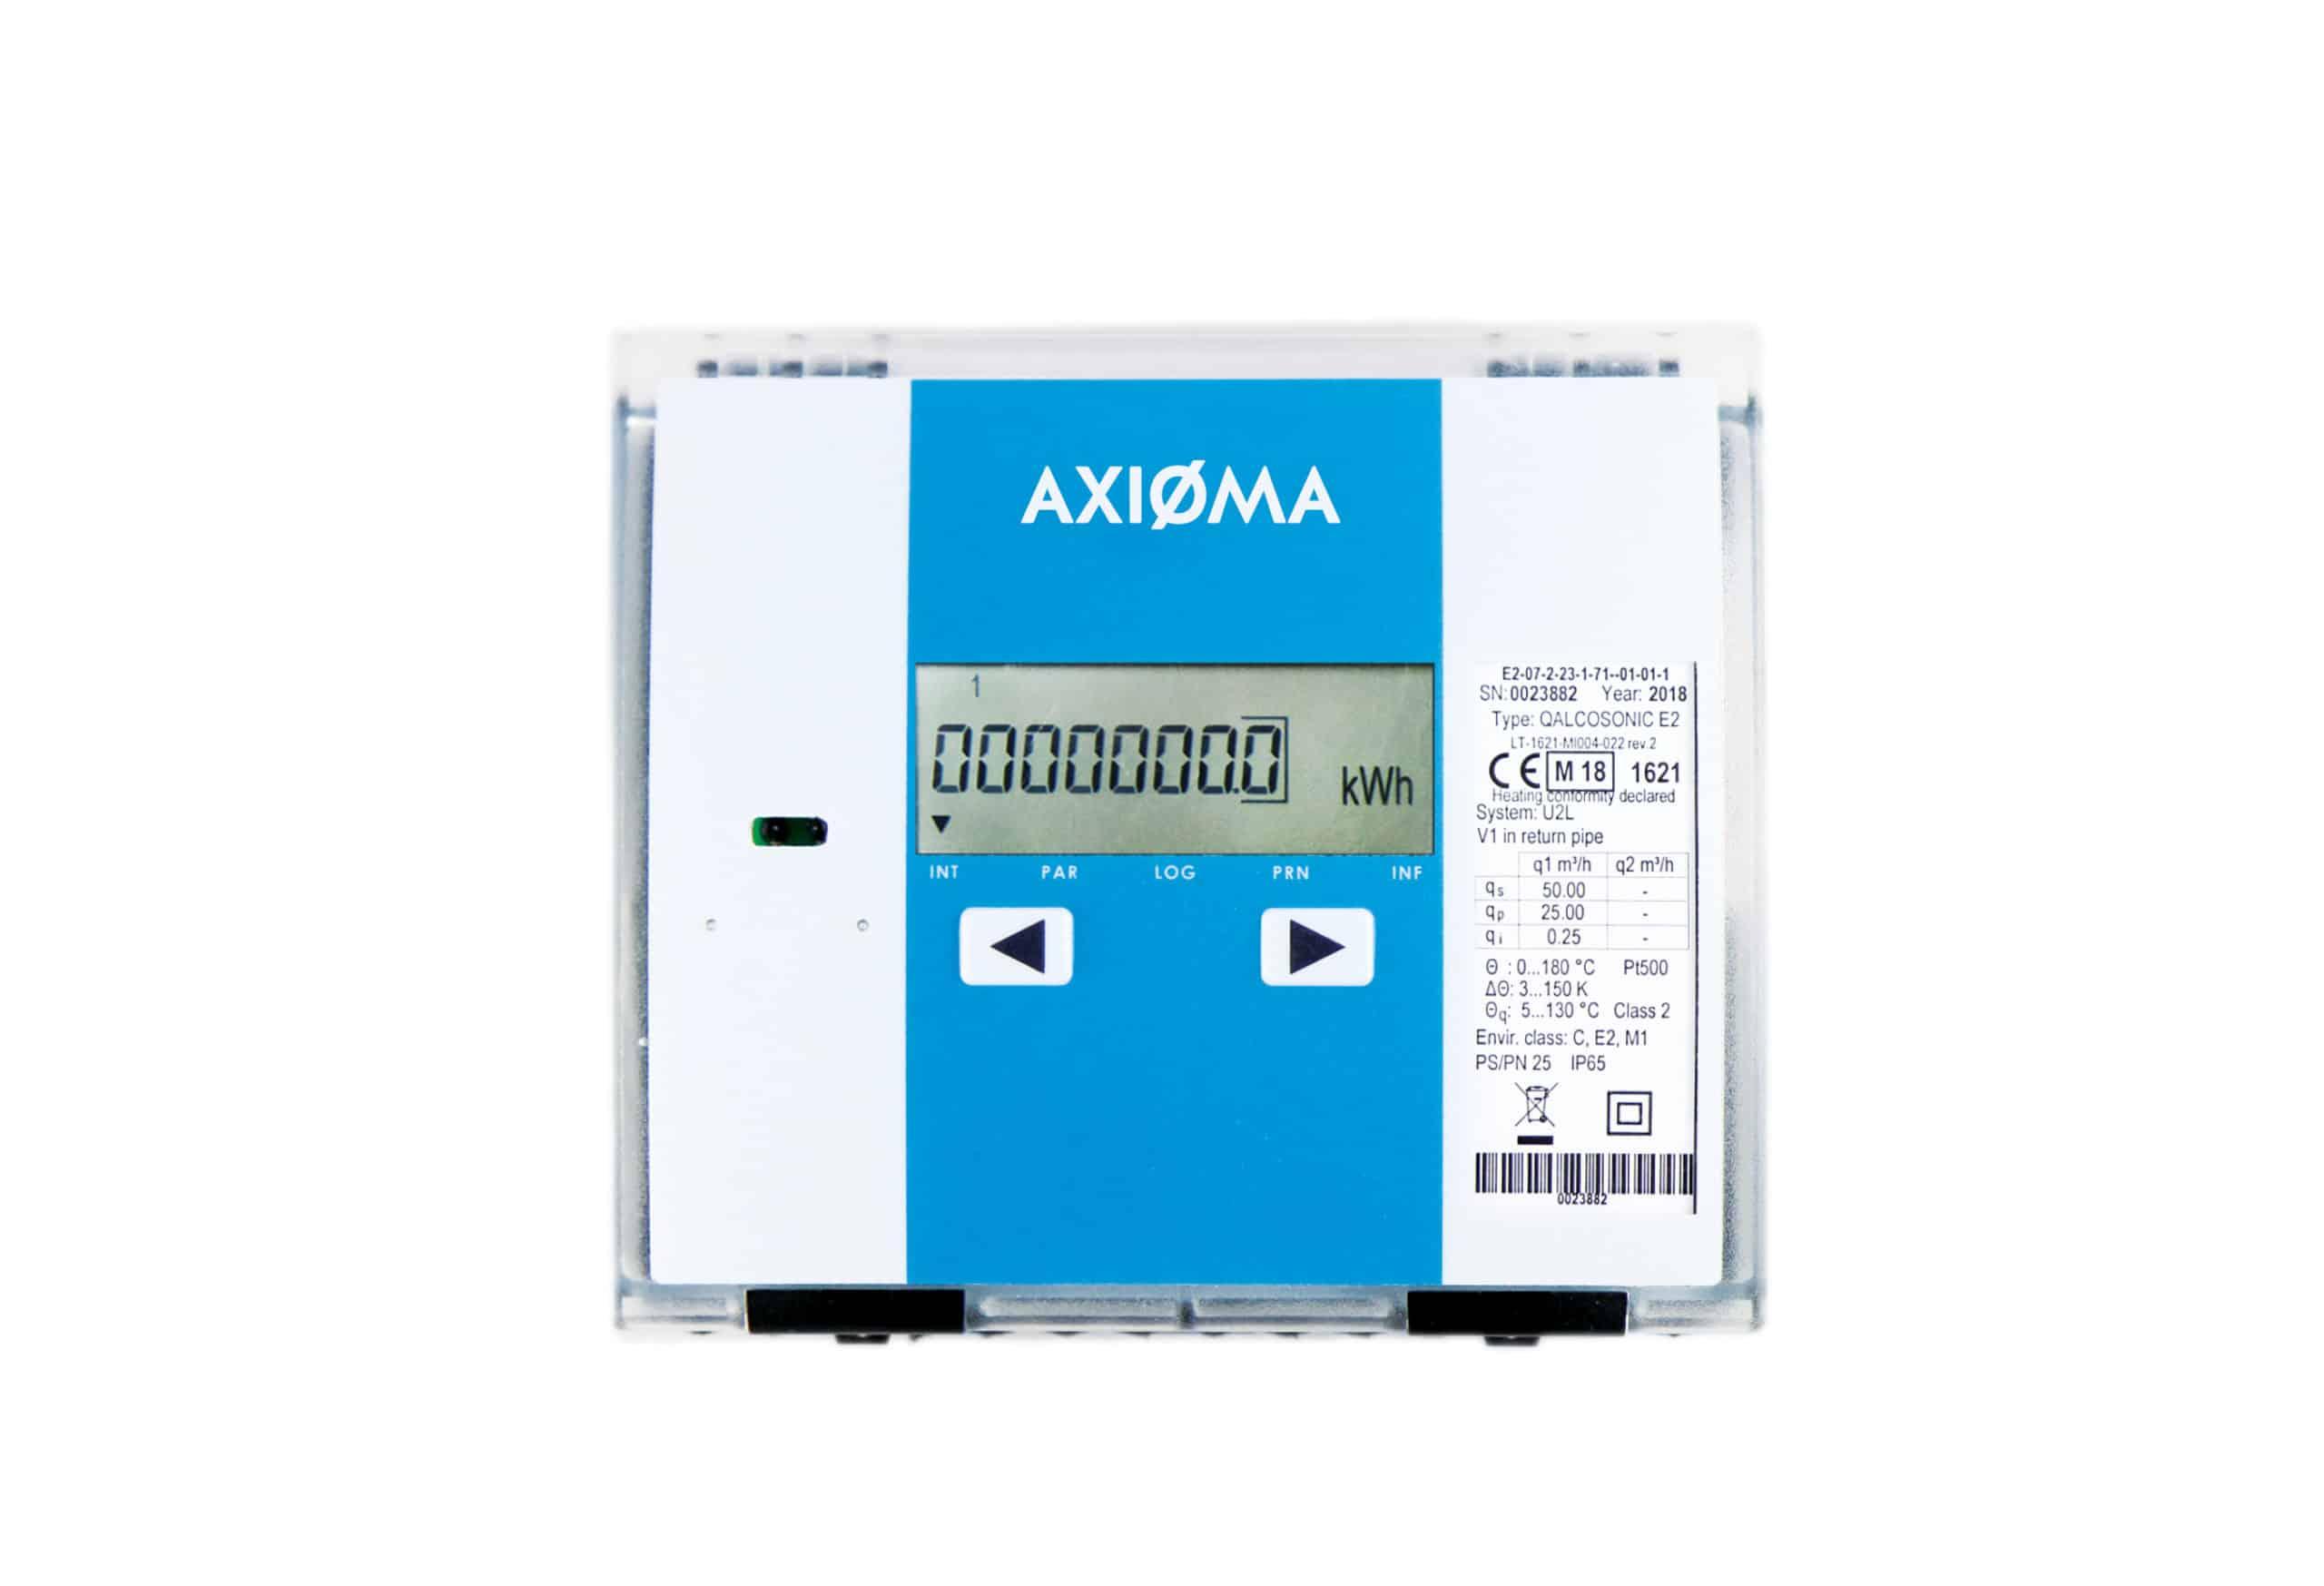 QALCOSONIC E2 - Ultrasonic heat and water quantity counter